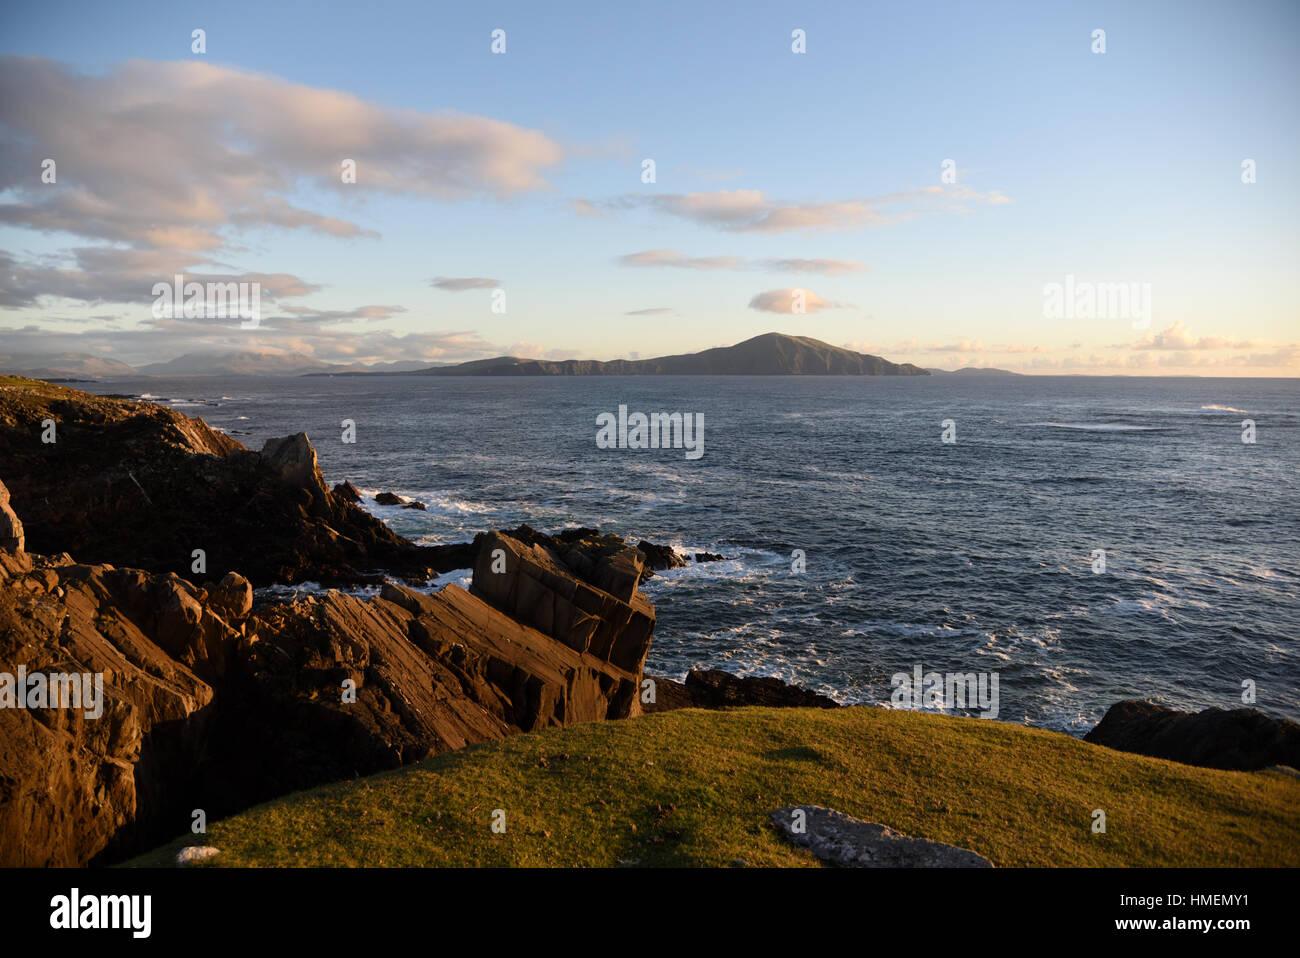 Clare Island off the Achill Island - Ireland - Stock Image